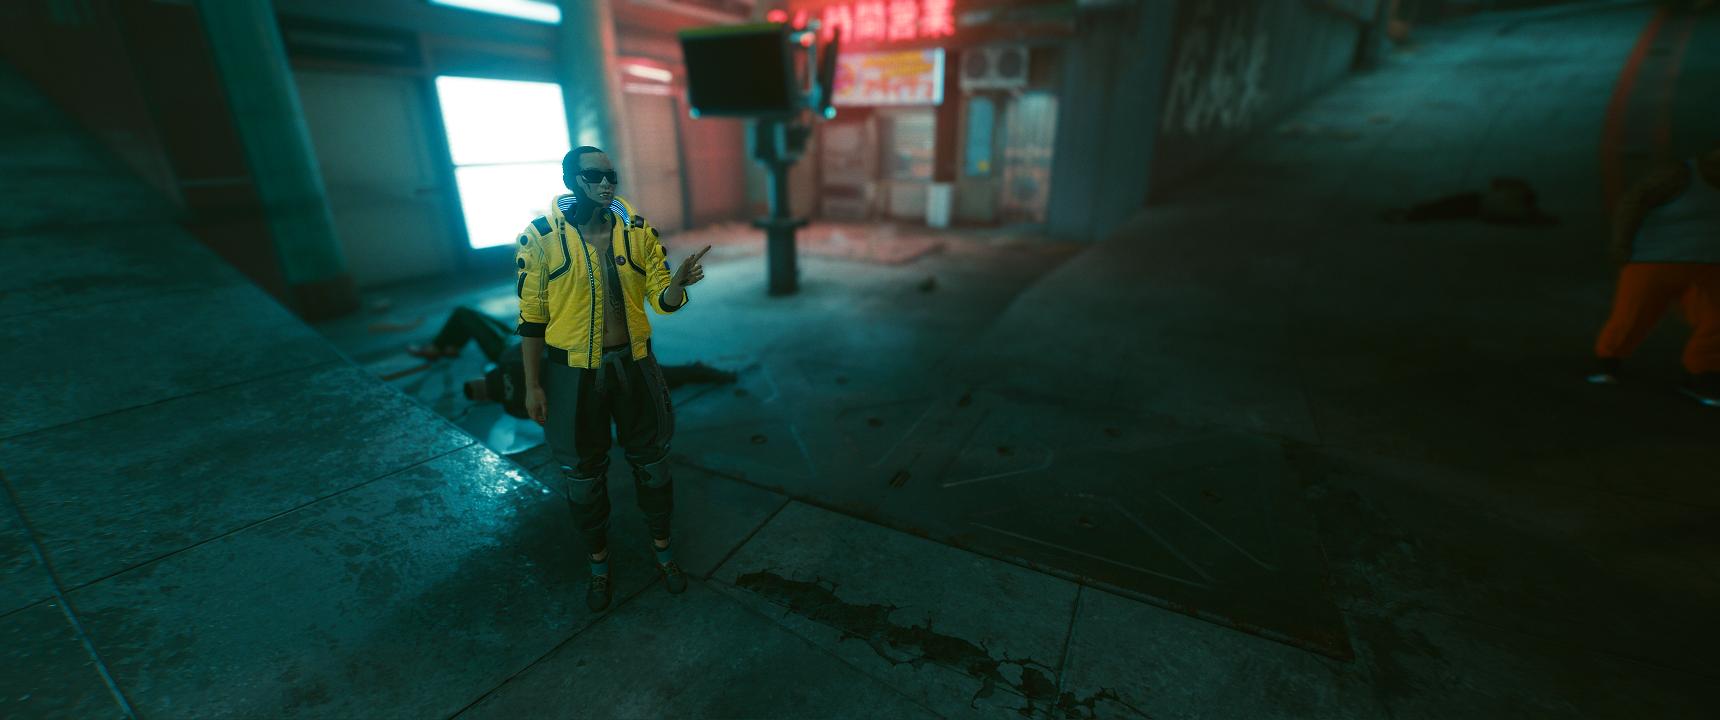 Cyberpunk 2077 Screenshot 2020.12.11 - 00.52.22.58.png